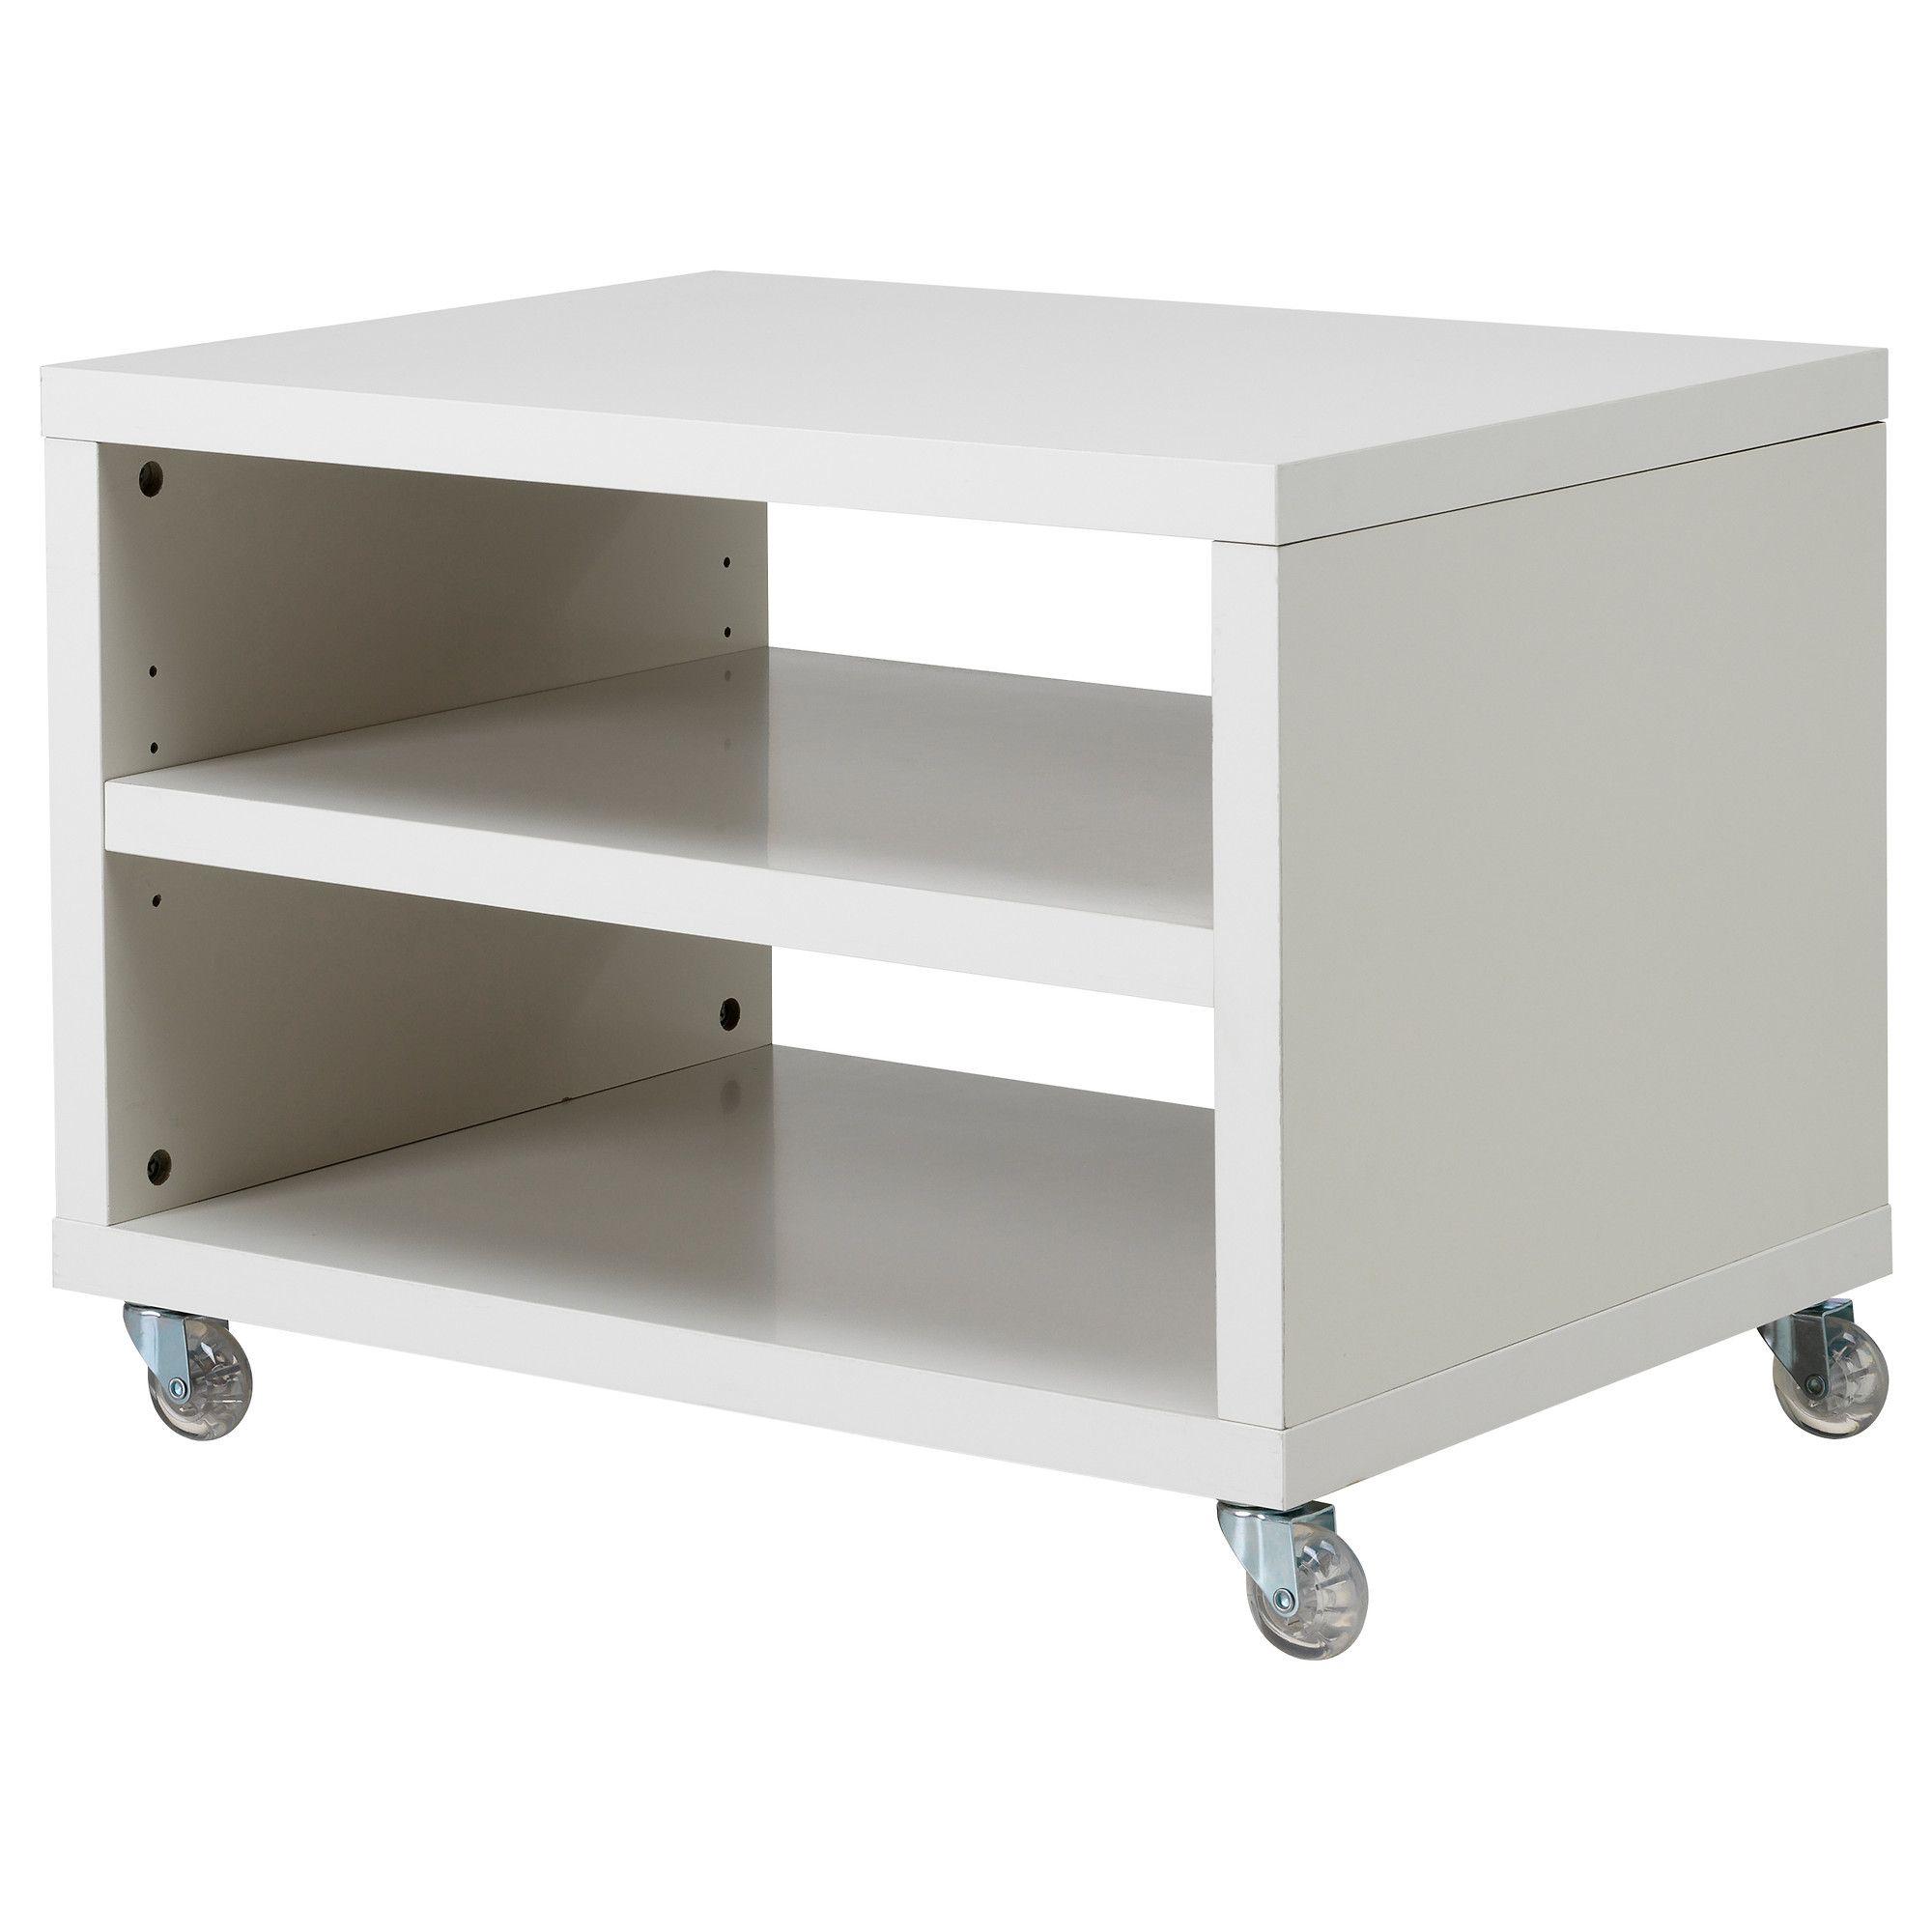 Ikea Us Furniture And Home Furnishings Printer Stand Ikea Ikea Nightstand Ikea Bedroom